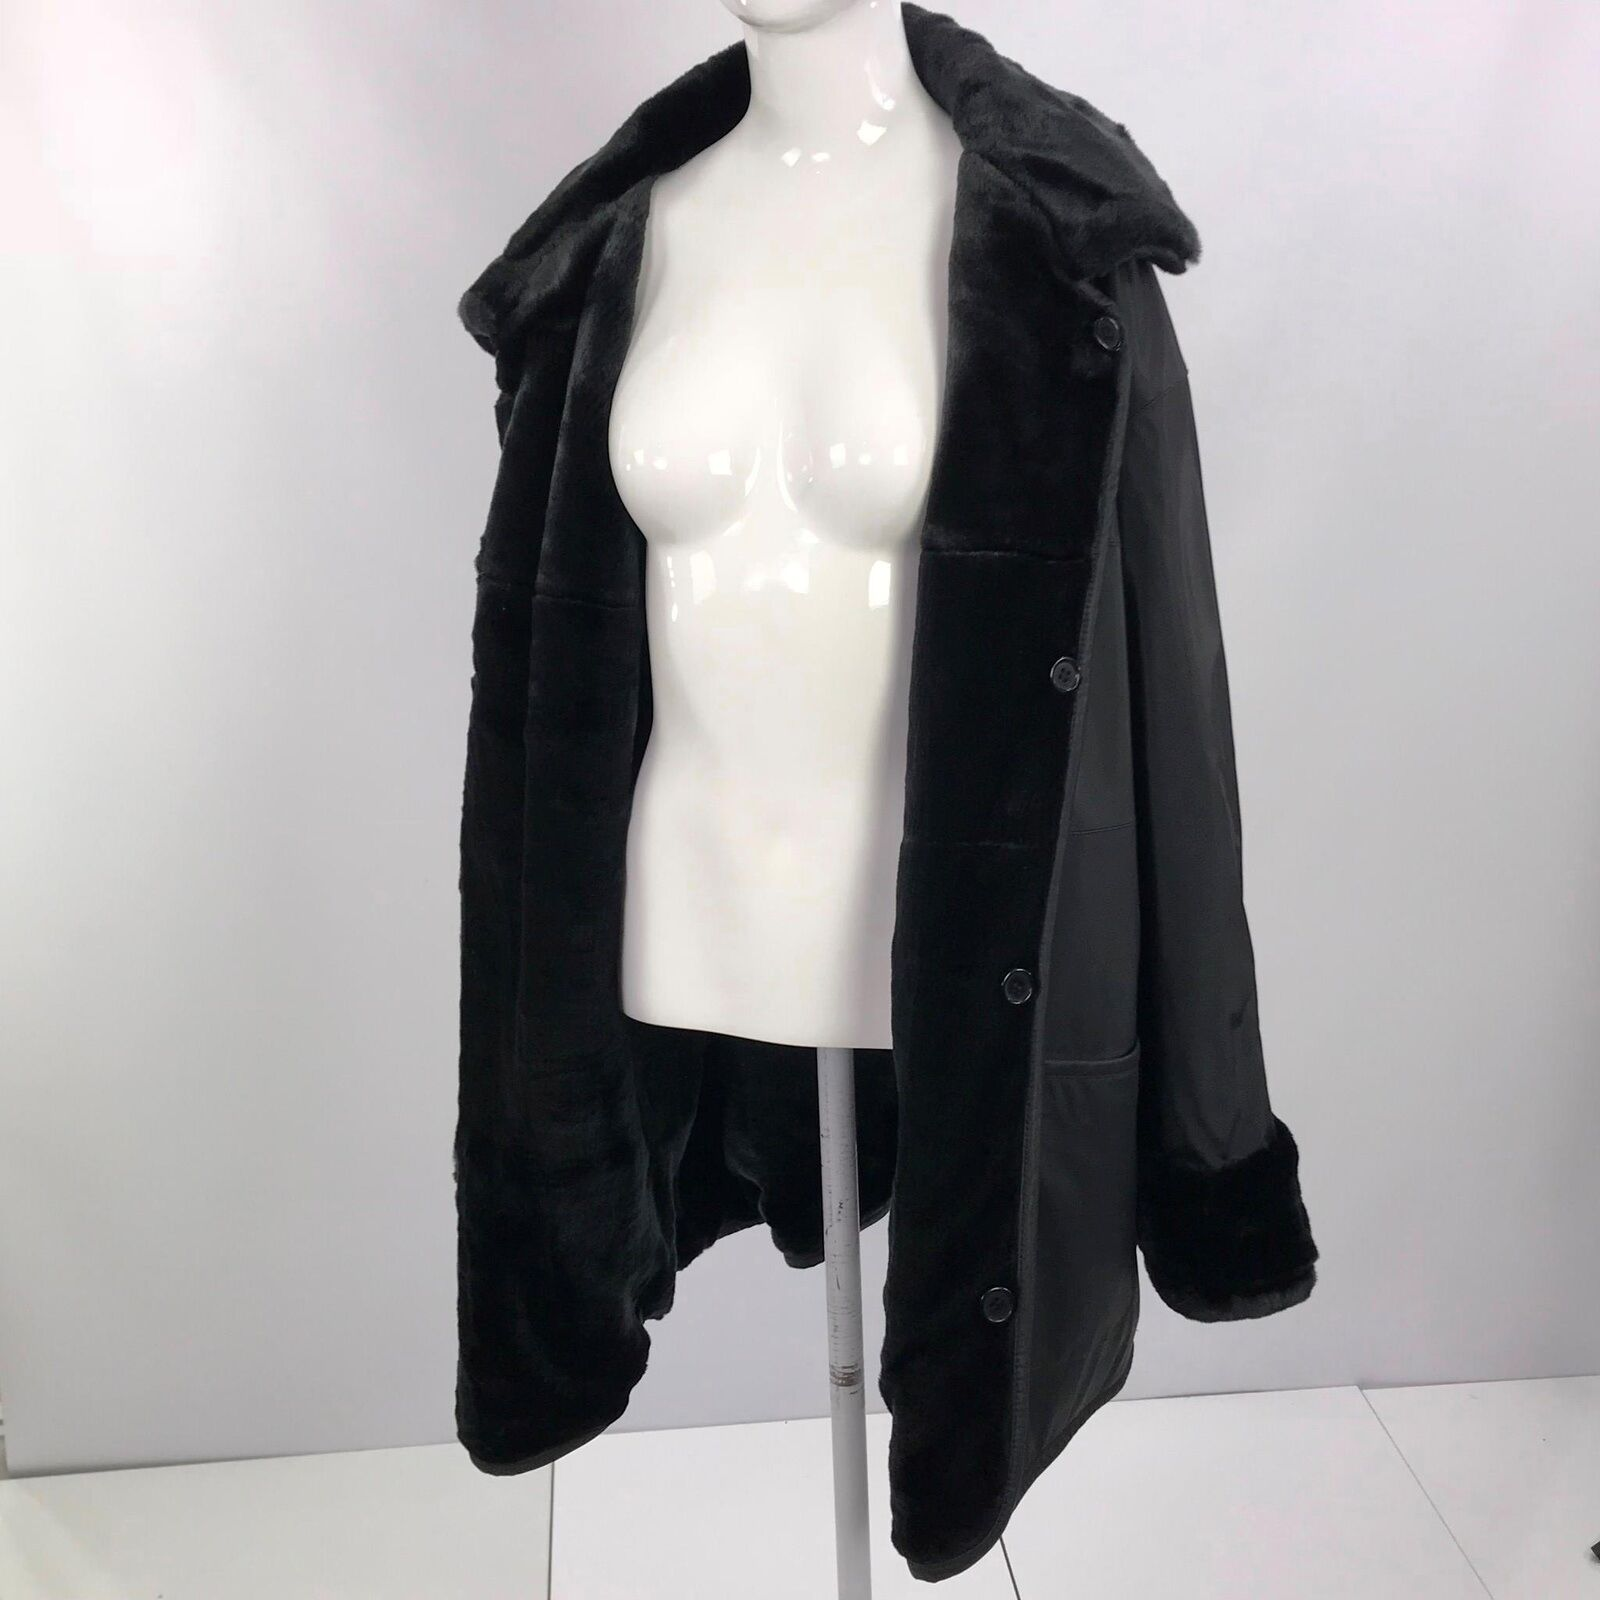 Outbrook Mujer 2X Reversible Abrigo  Mink Faux Fur bolsillos laterales sólido para todo clima  hasta un 65% de descuento